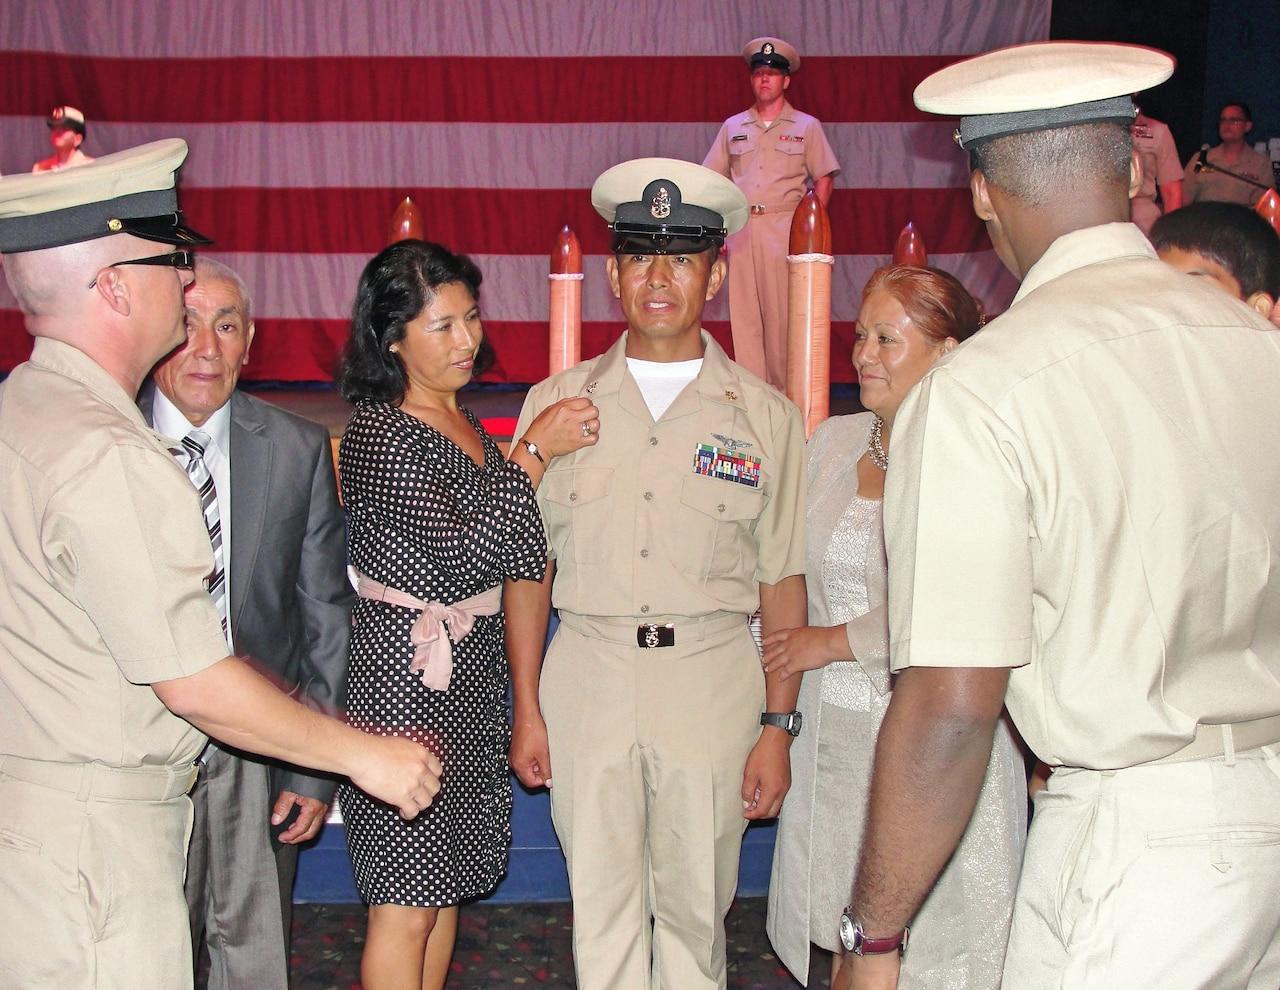 People surround a sailor in his dress uniform.